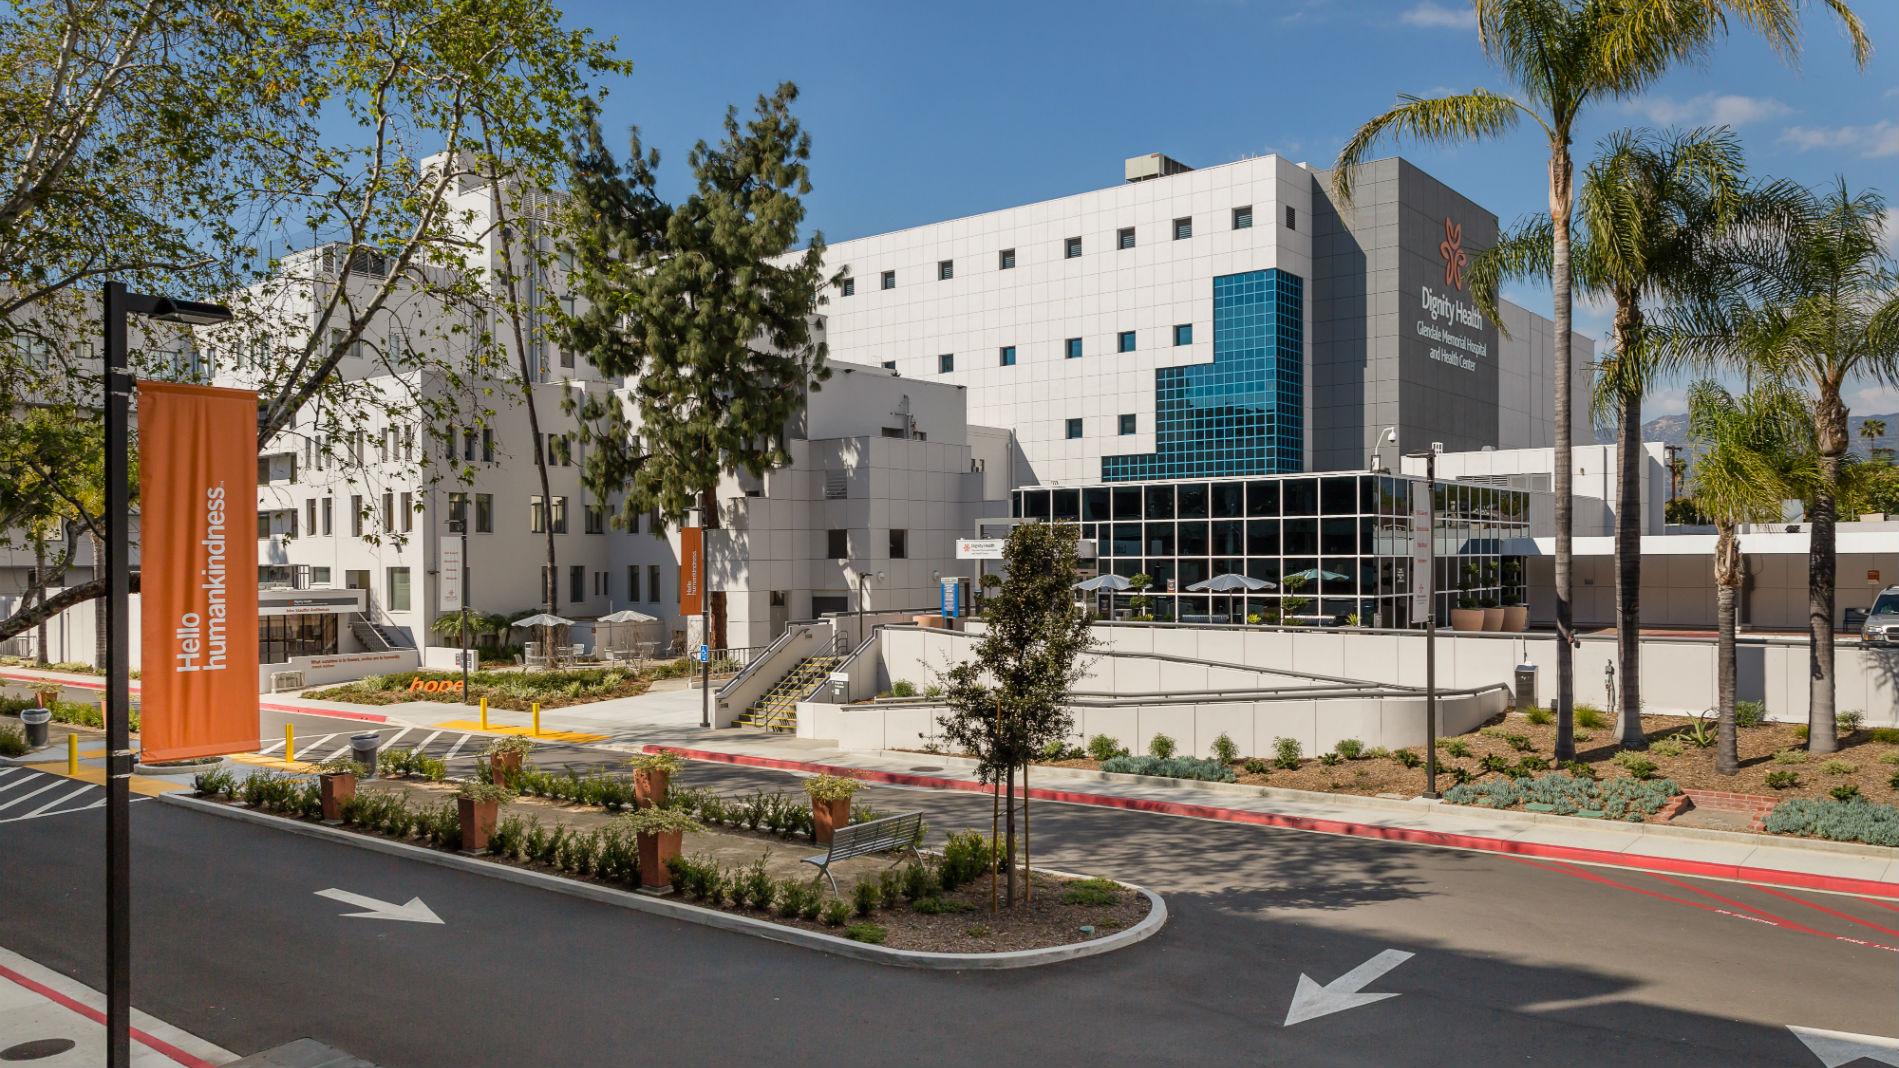 Dignity Health - Glendale Memorial Hospital image 3